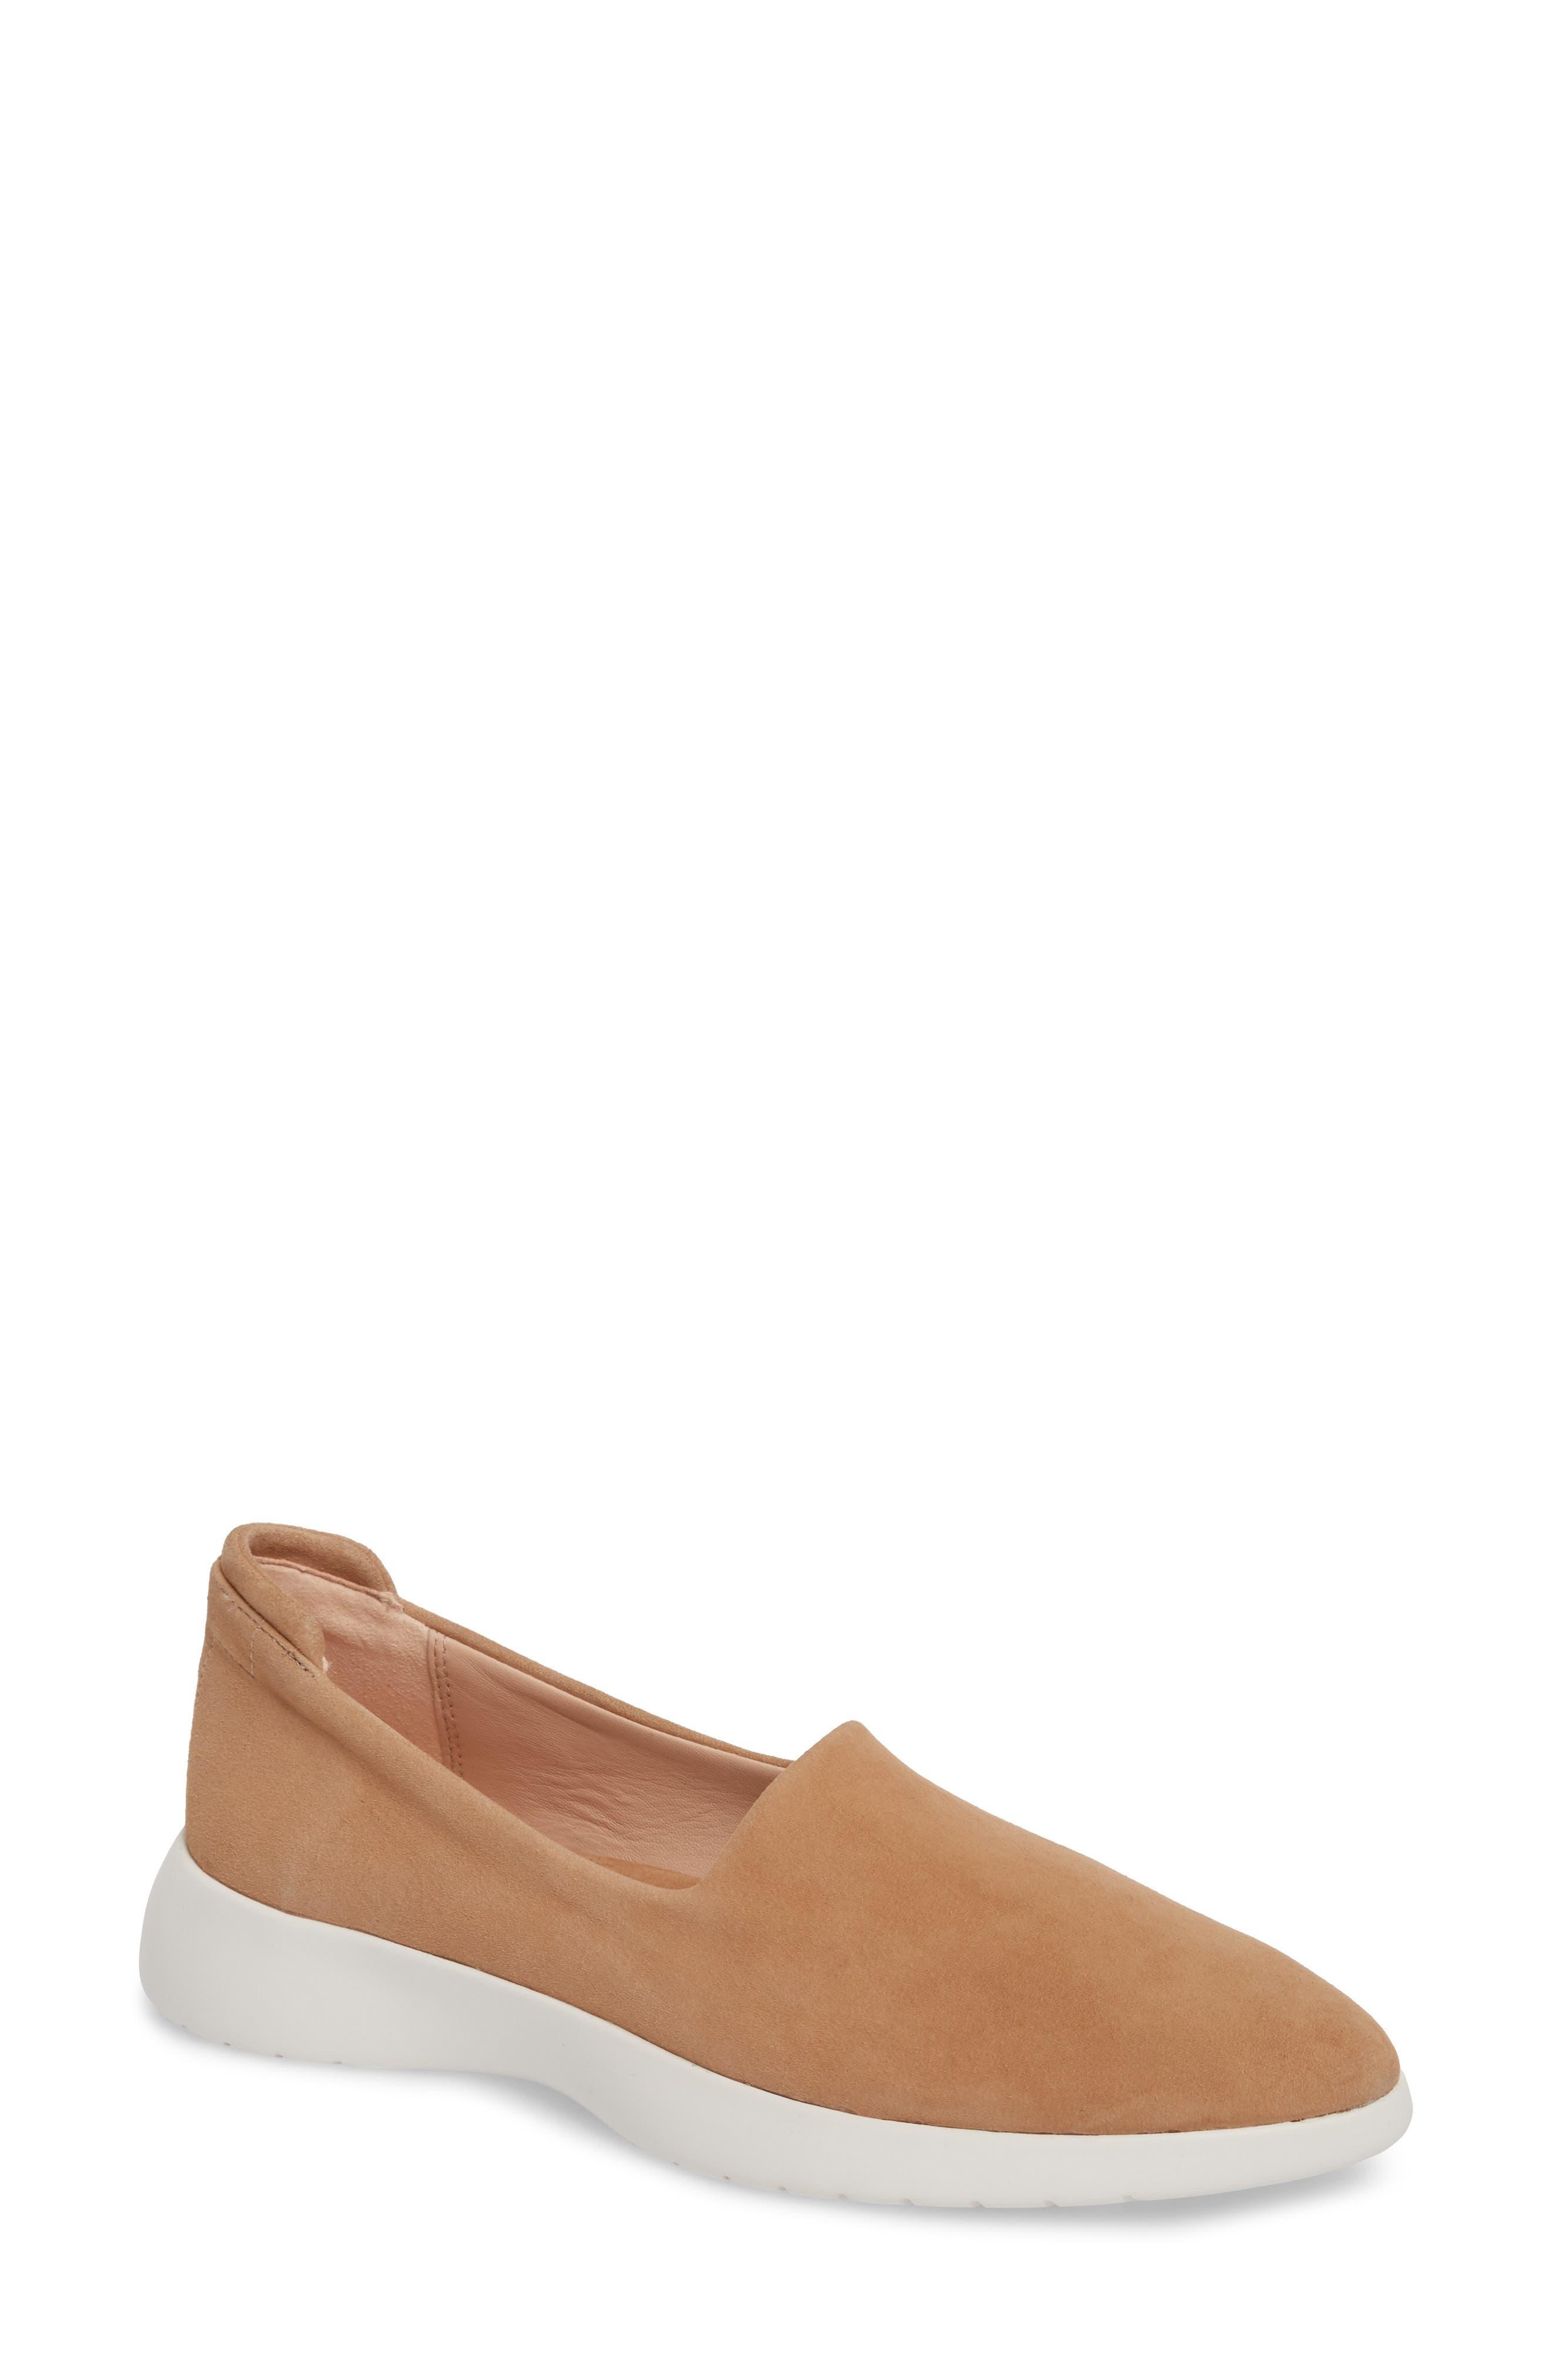 Darla Slip-On Sneaker,                         Main,                         color, SOFT BEIGE SUEDE